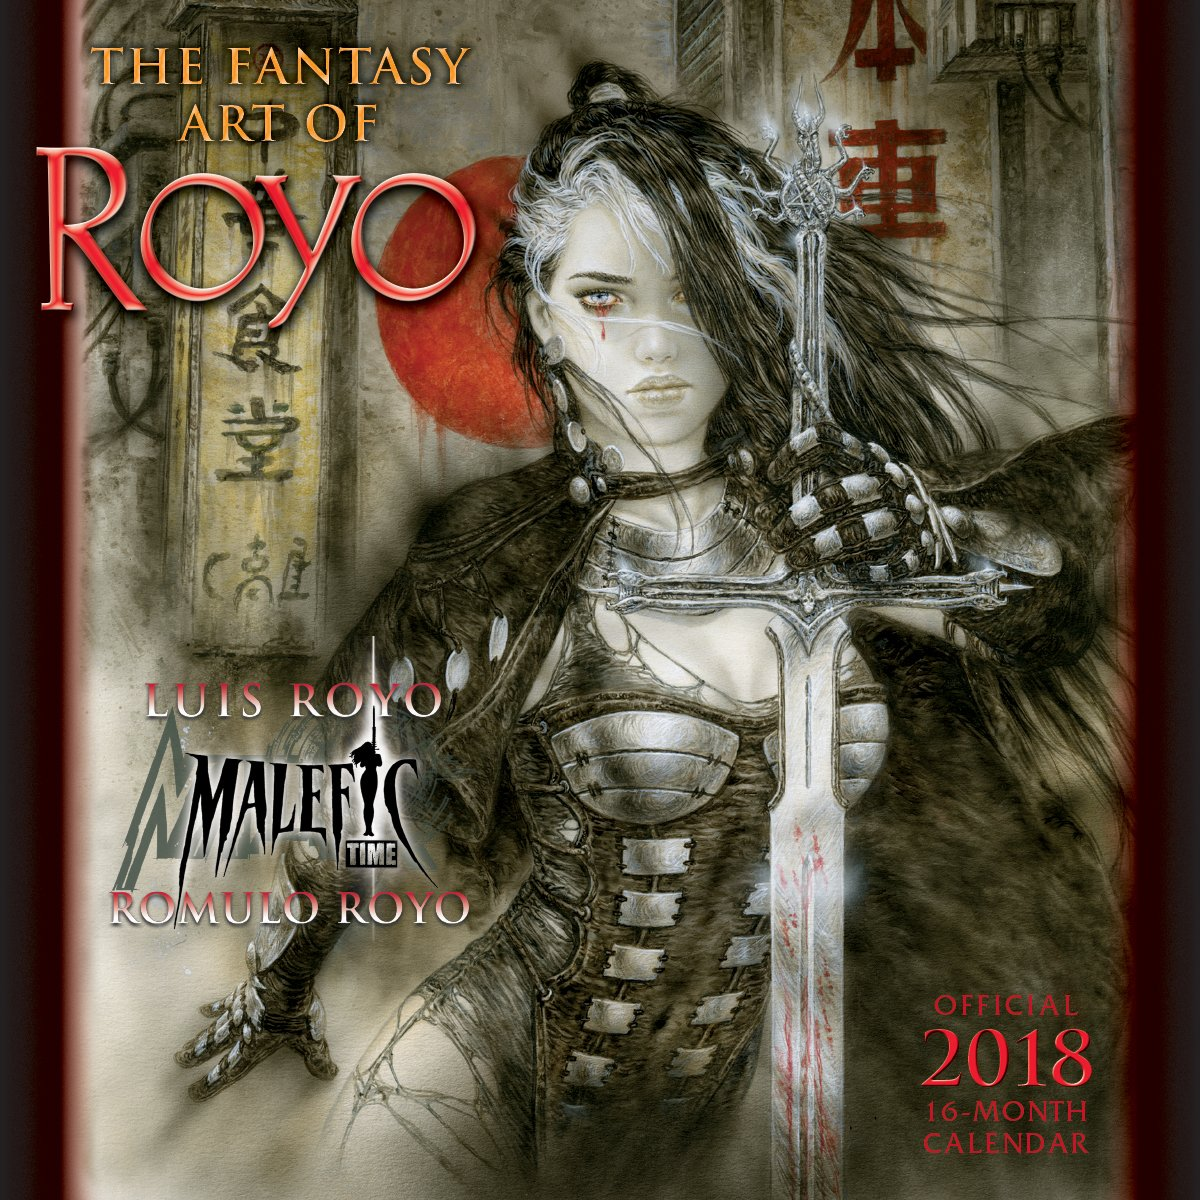 Download The Fantasy Art Of Royo 2018 Wall Calendar (CA0132) ebook